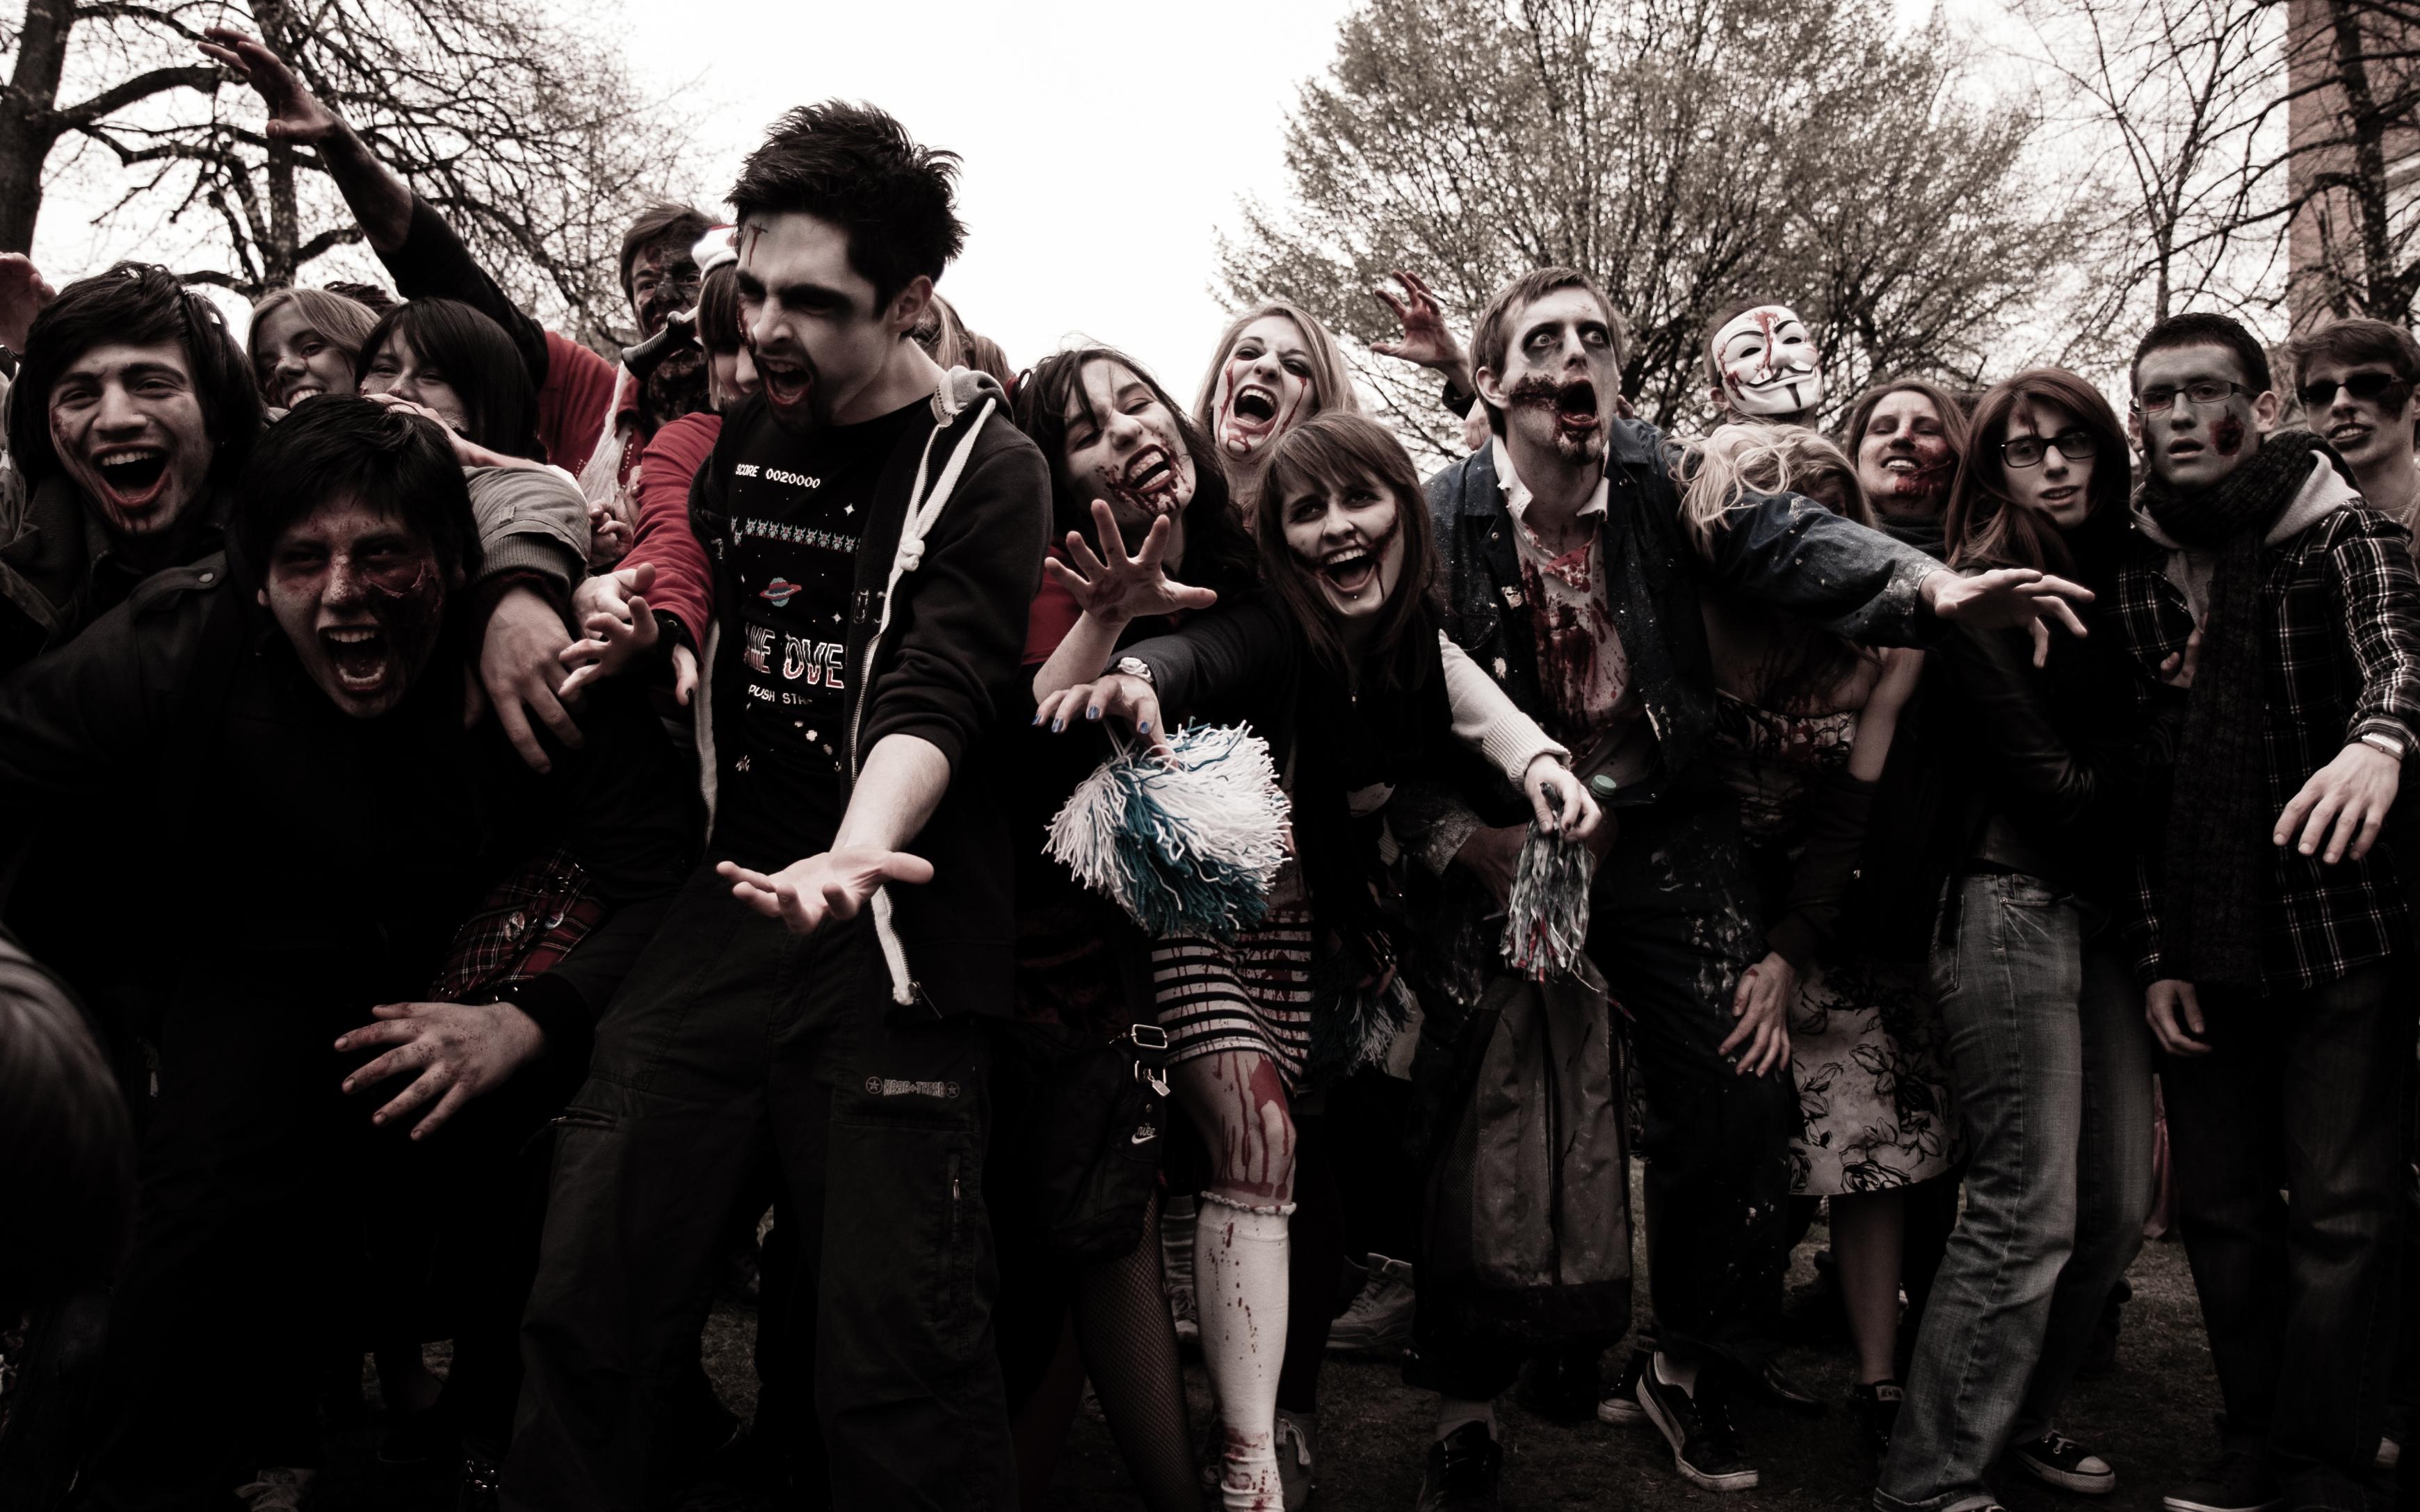 Zombie day 6 - bifff 2012 photo